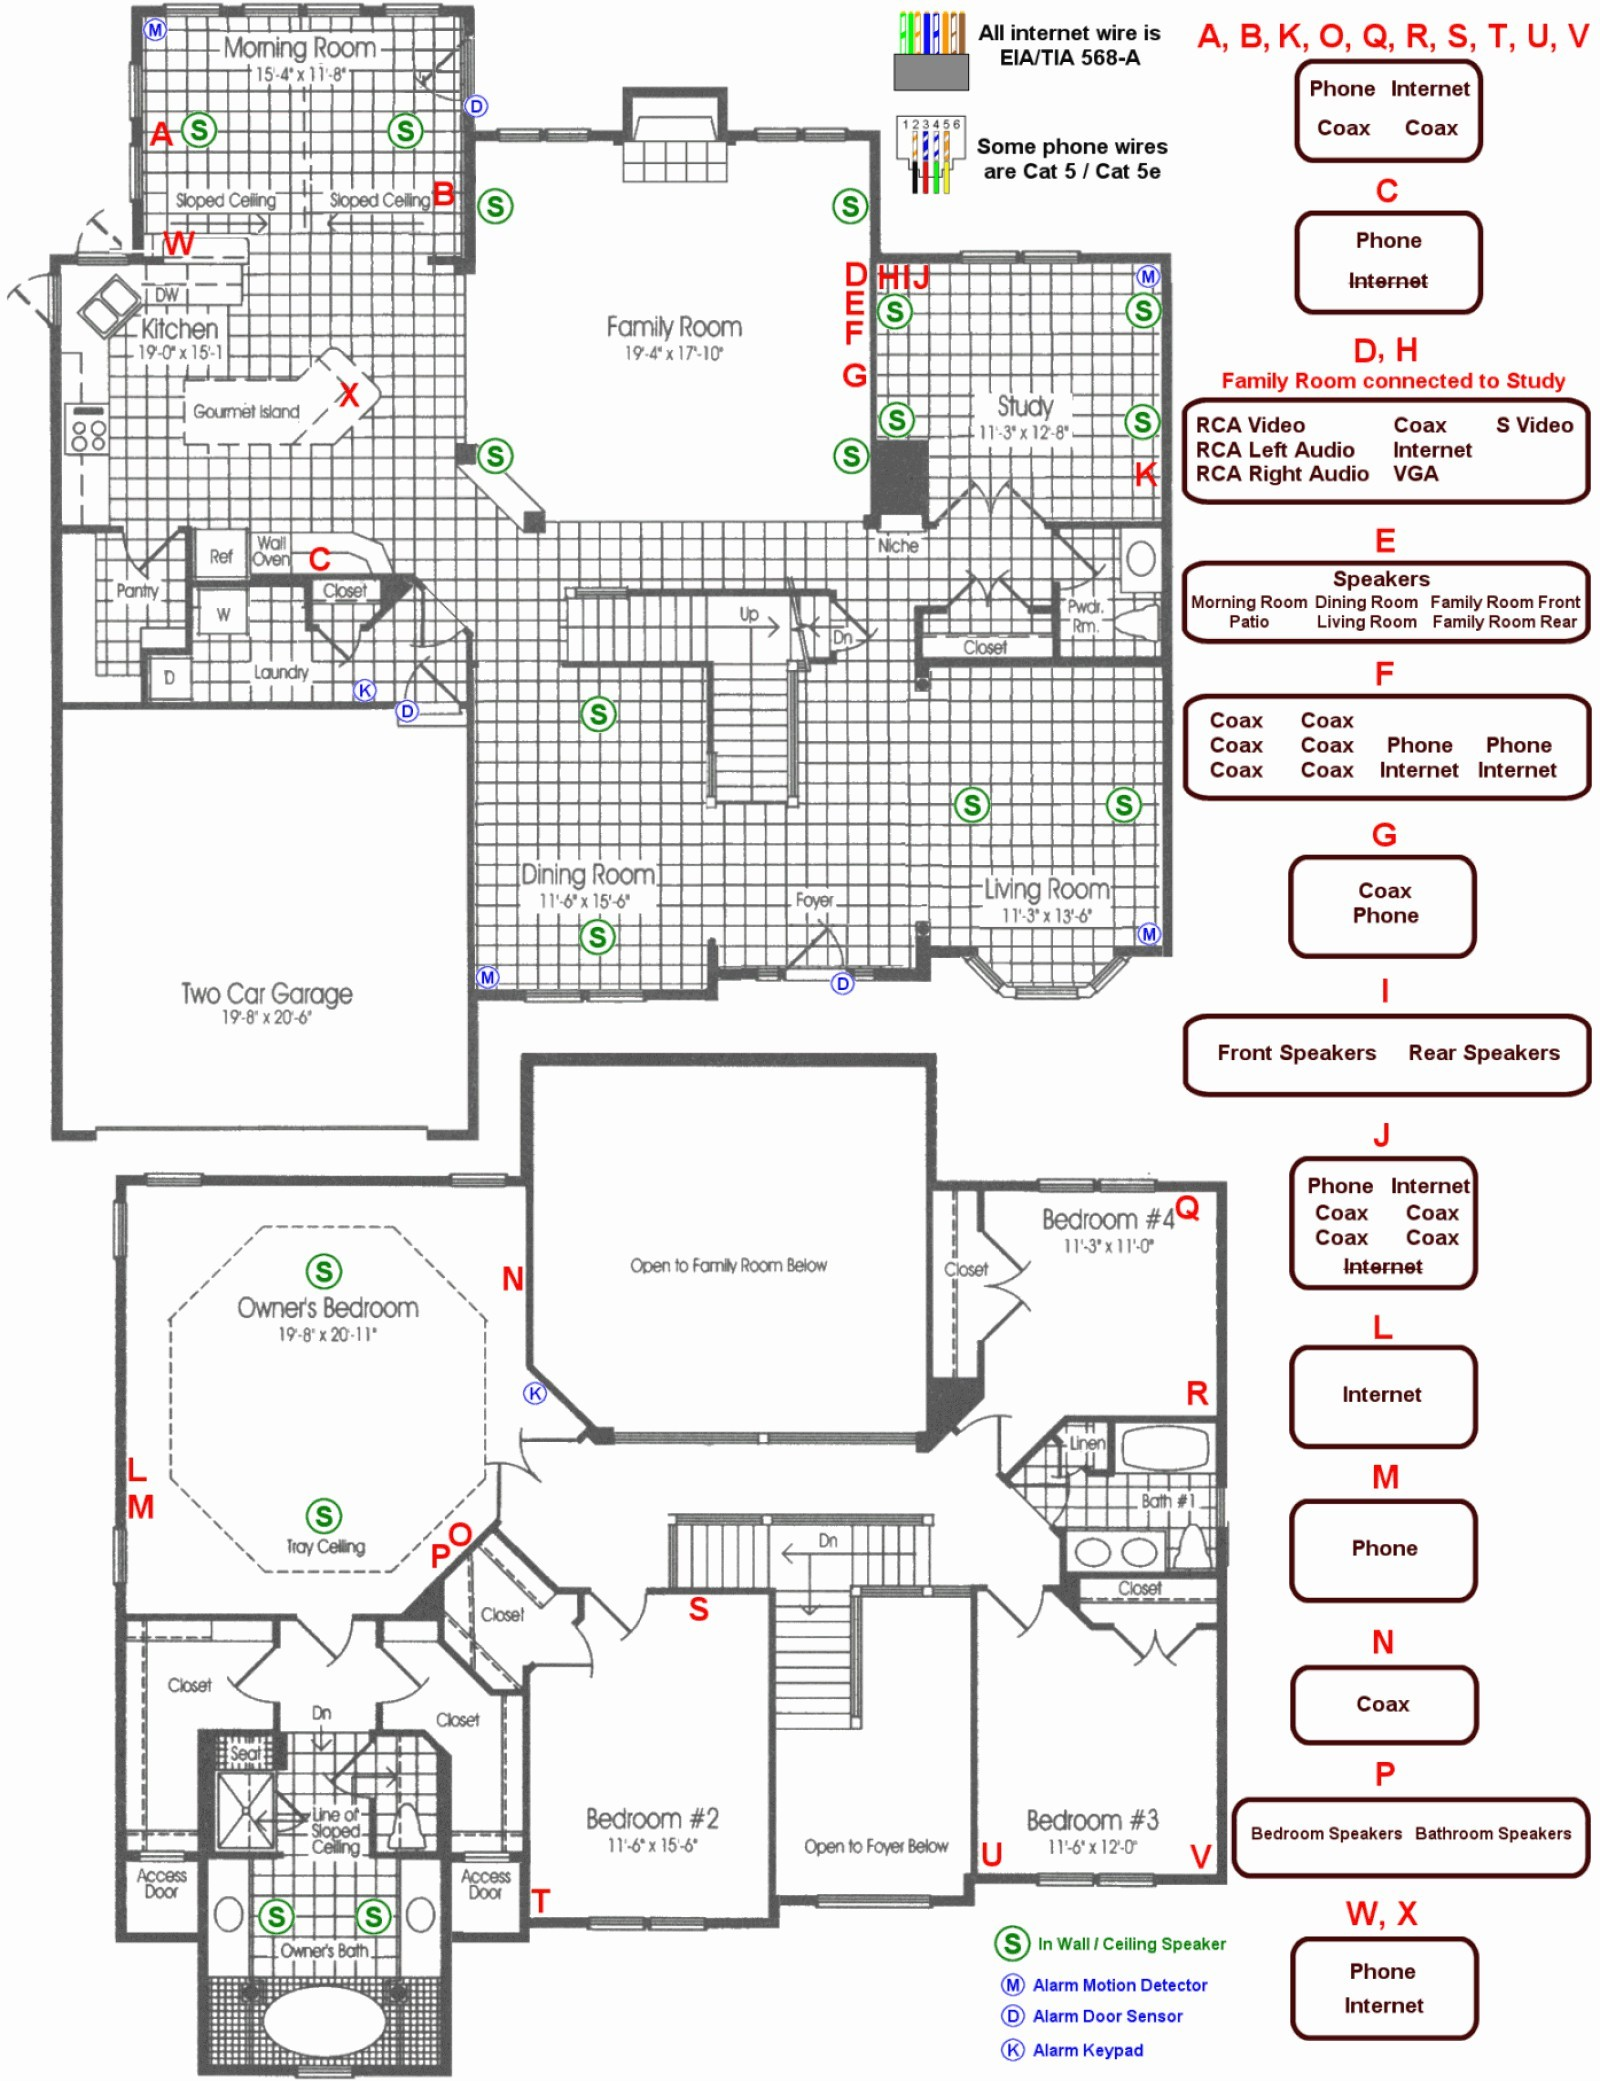 Electrical Wiring Diagram Symbols Inspirational The Whole House Electrical Wiring Wiring Diagrams